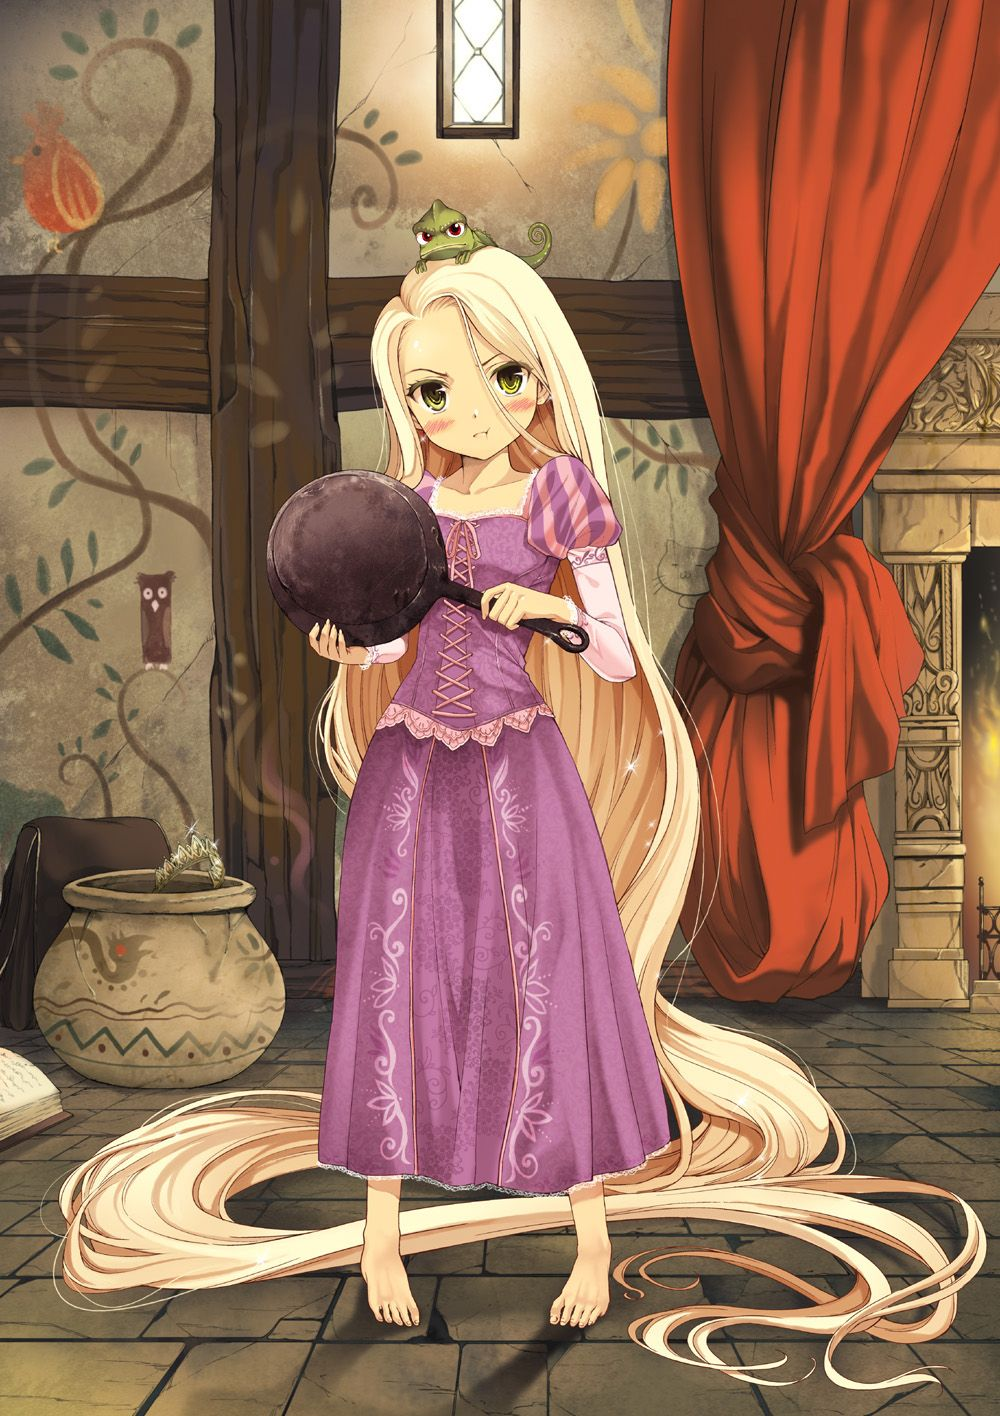 Disney cast games loirices ruivices e mais anime girl cute